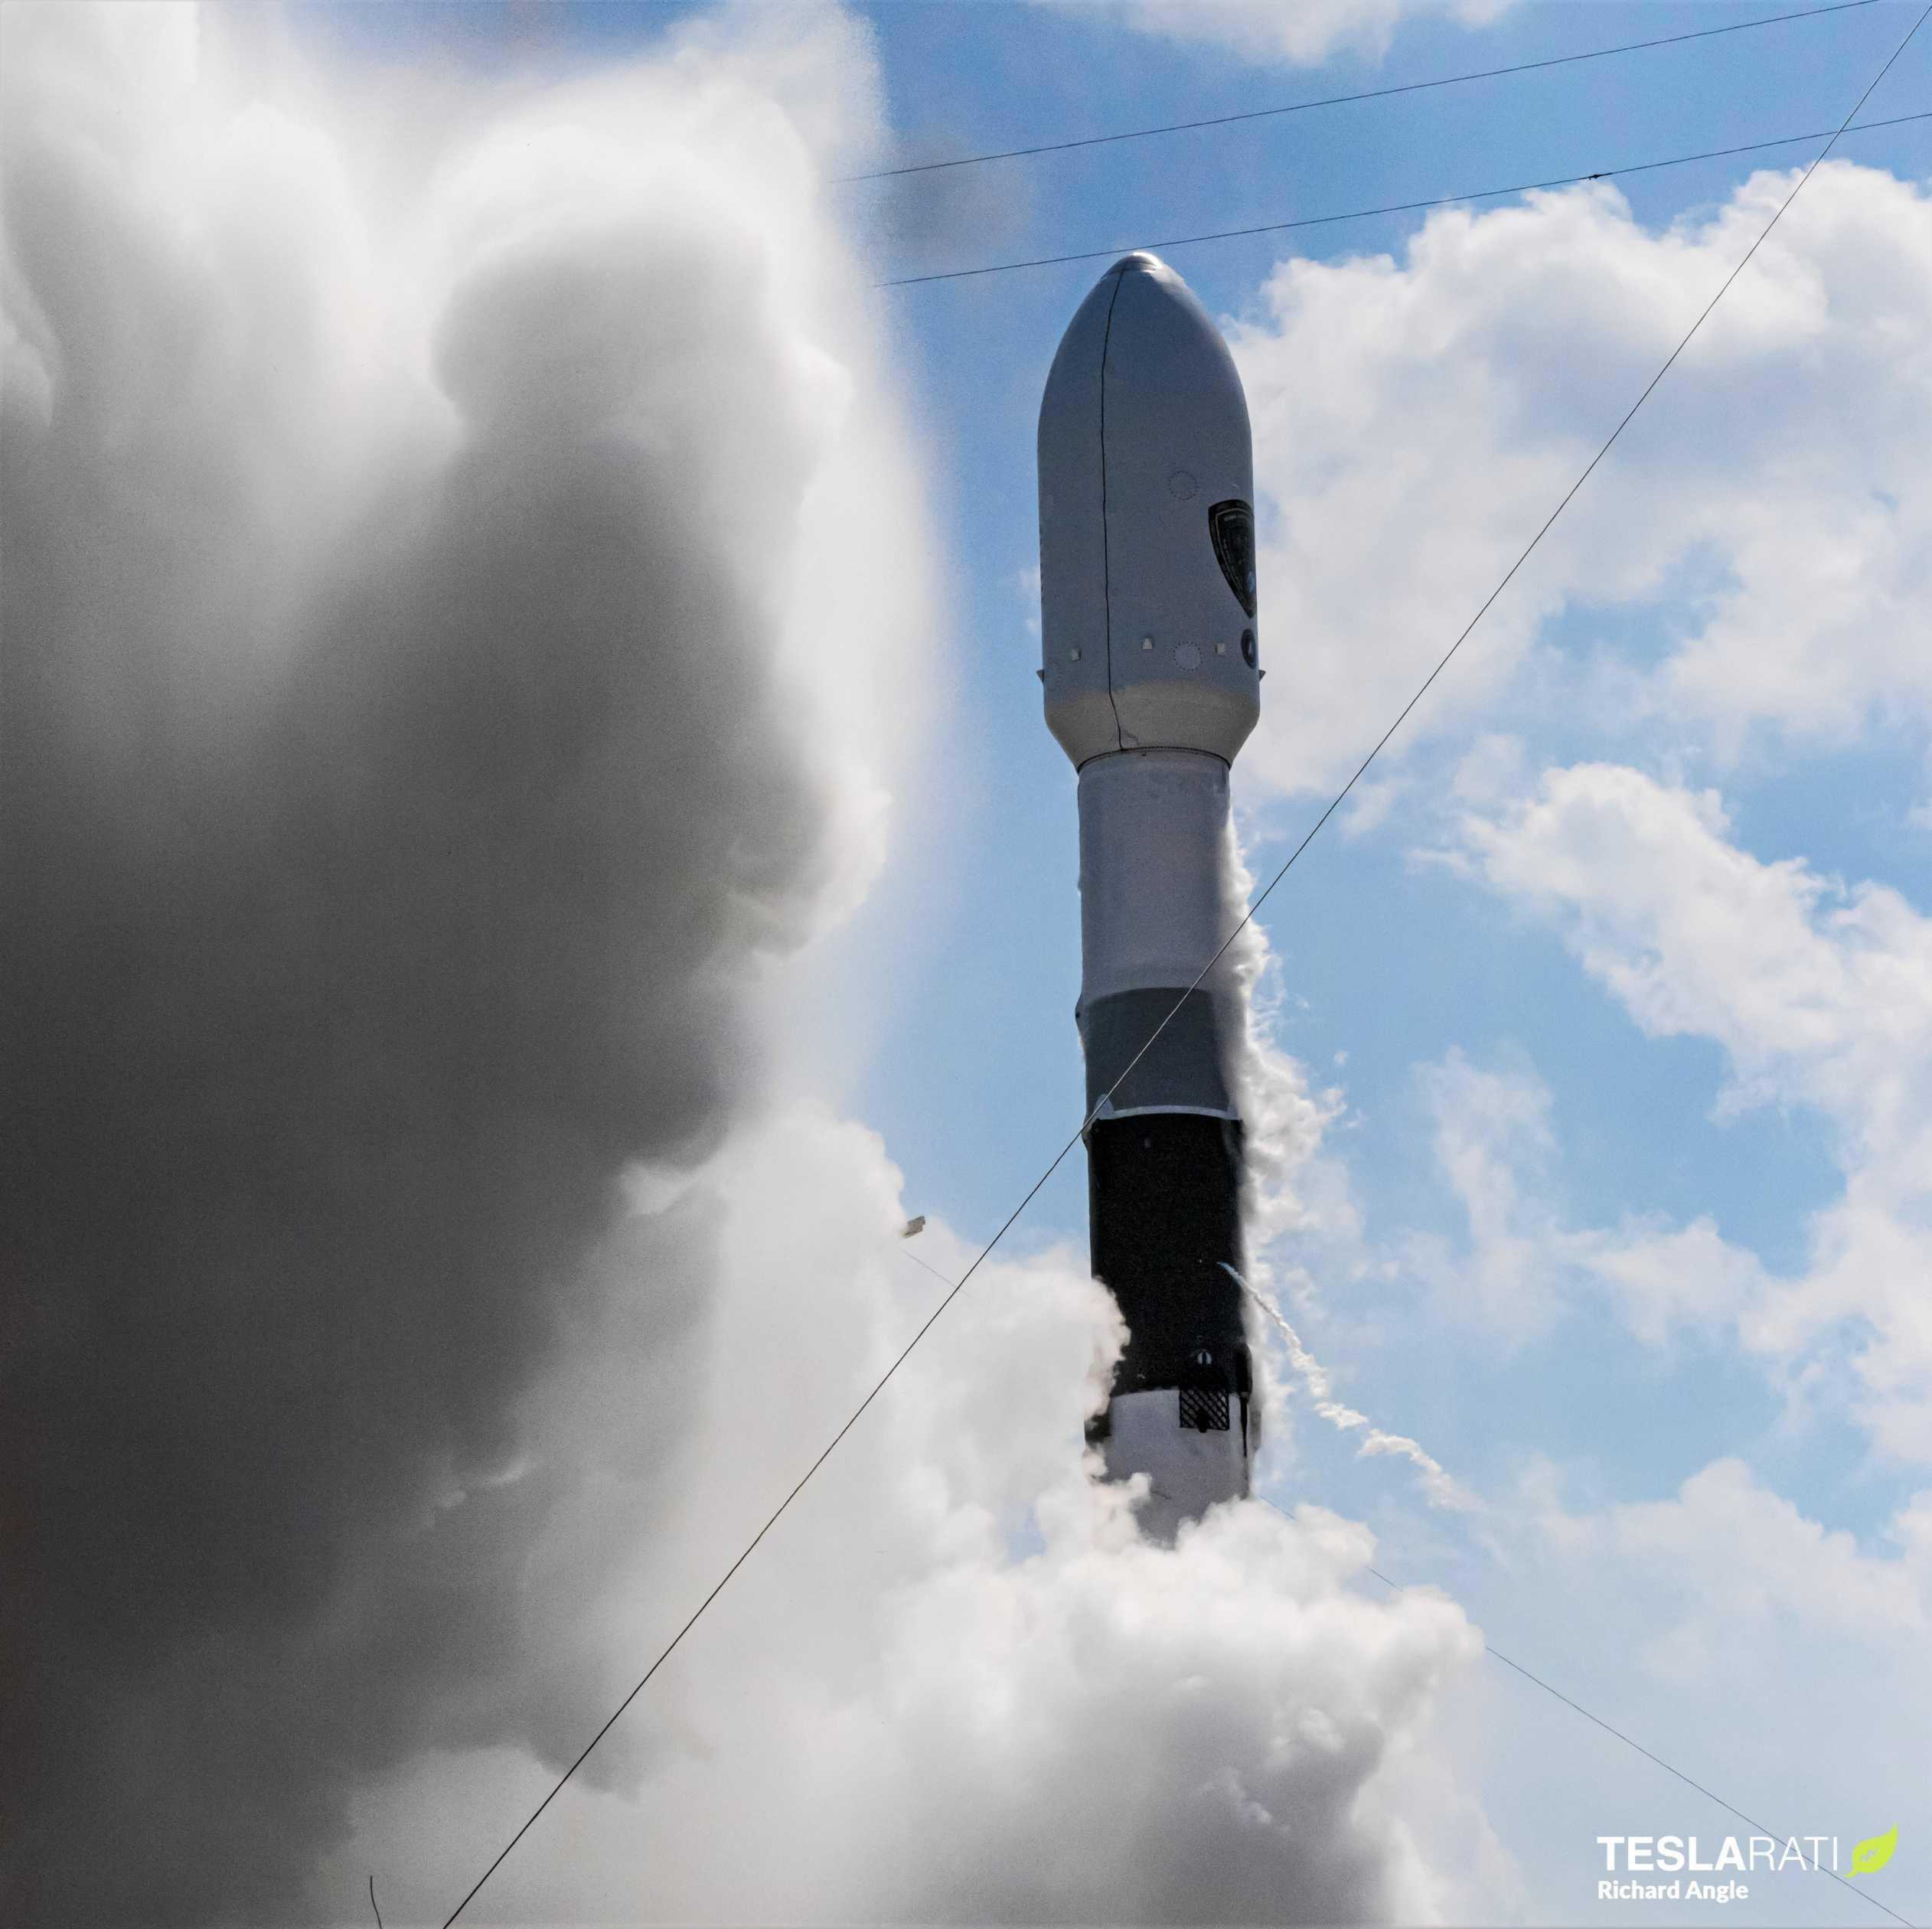 GPS III SV03 Falcon 9 B1060 063020 (Richard Angle) launch 8 crop (c)